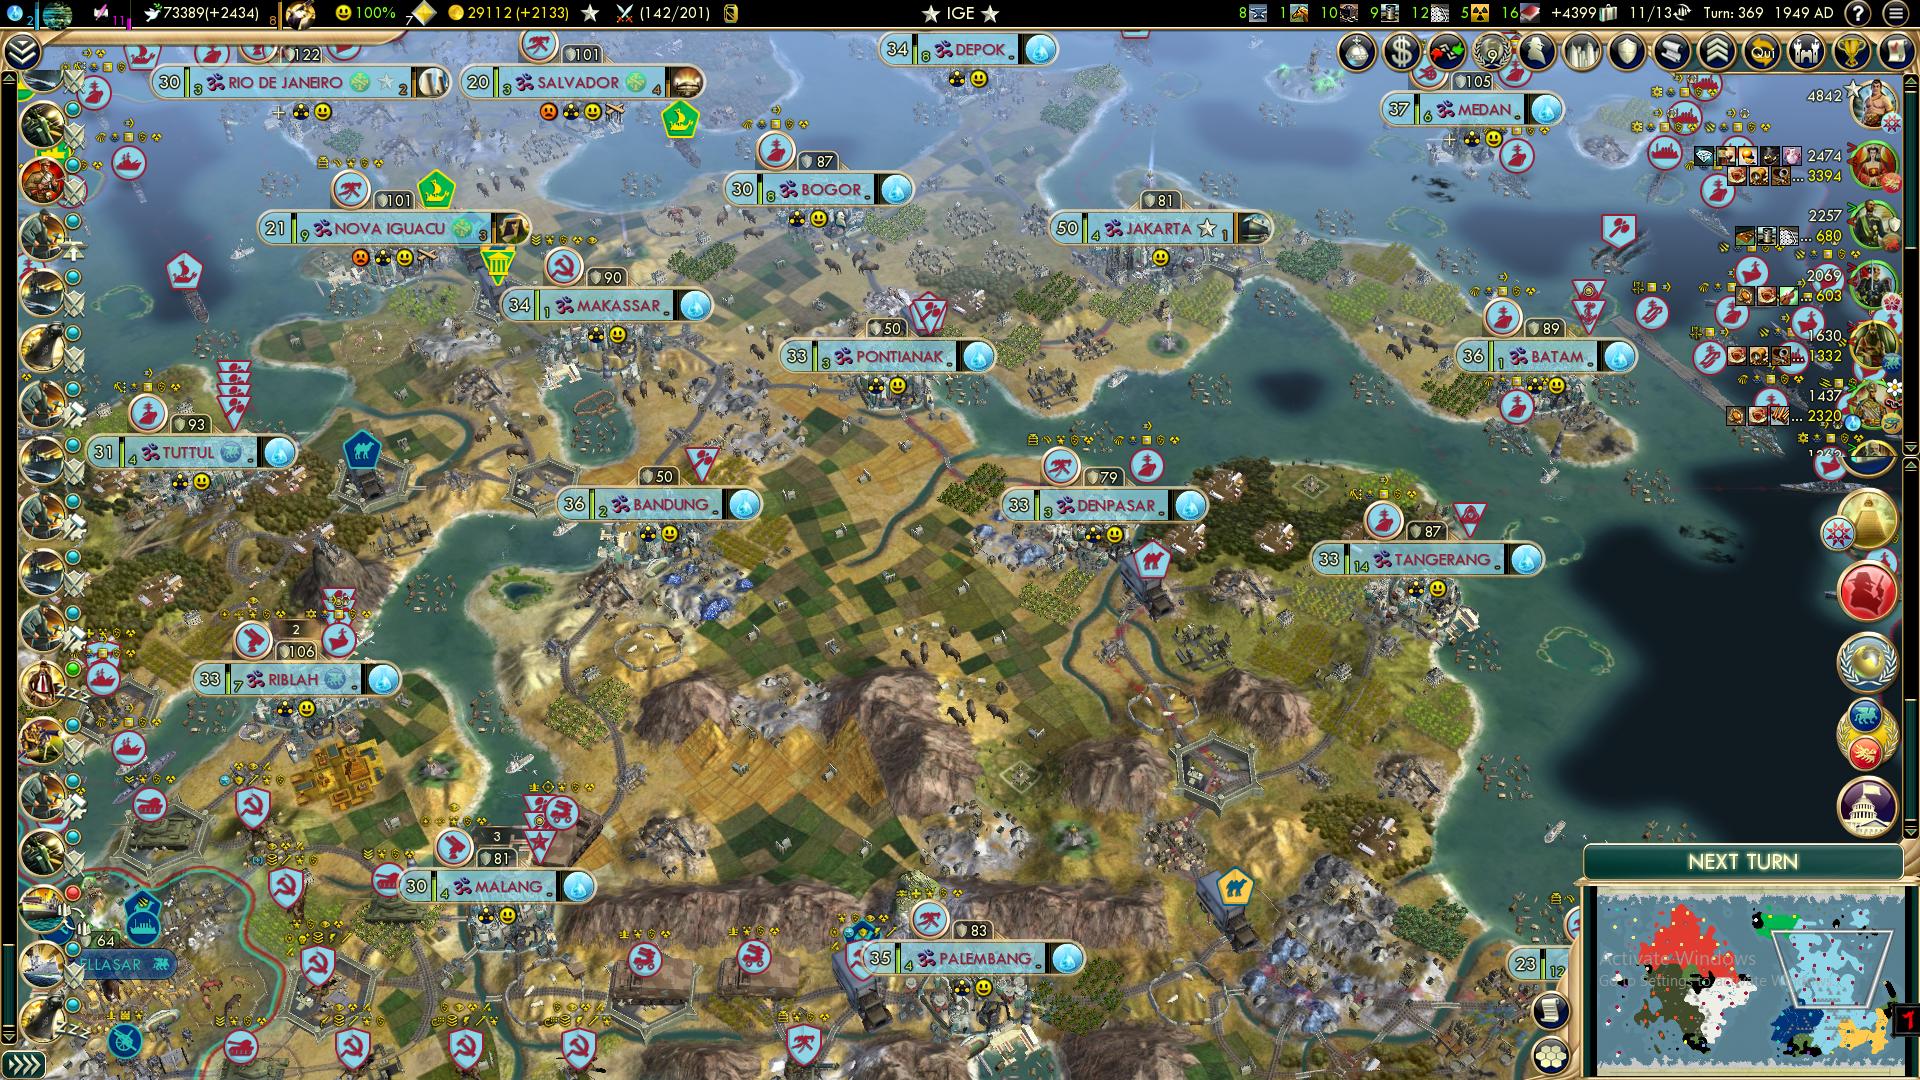 Screenshot (668).png